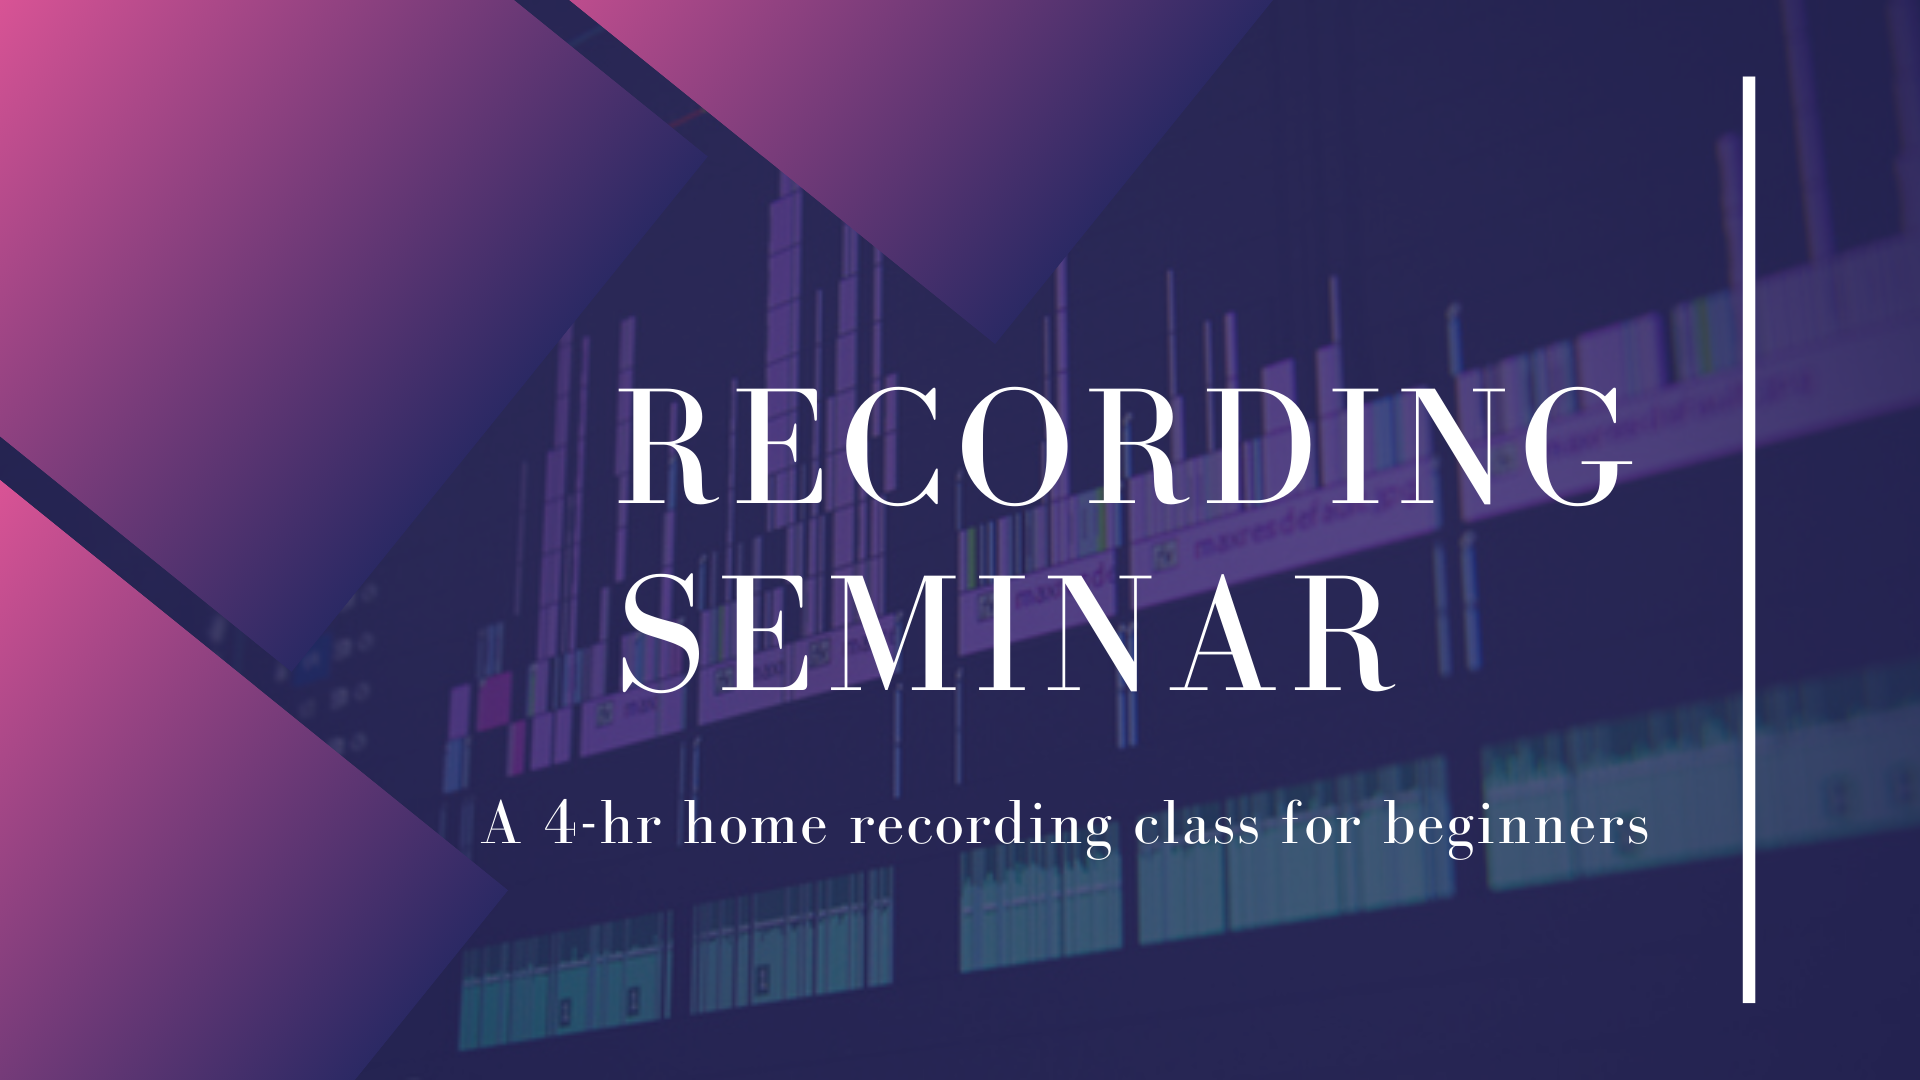 Recording Seminar - a 4 Hour Class for Beginners